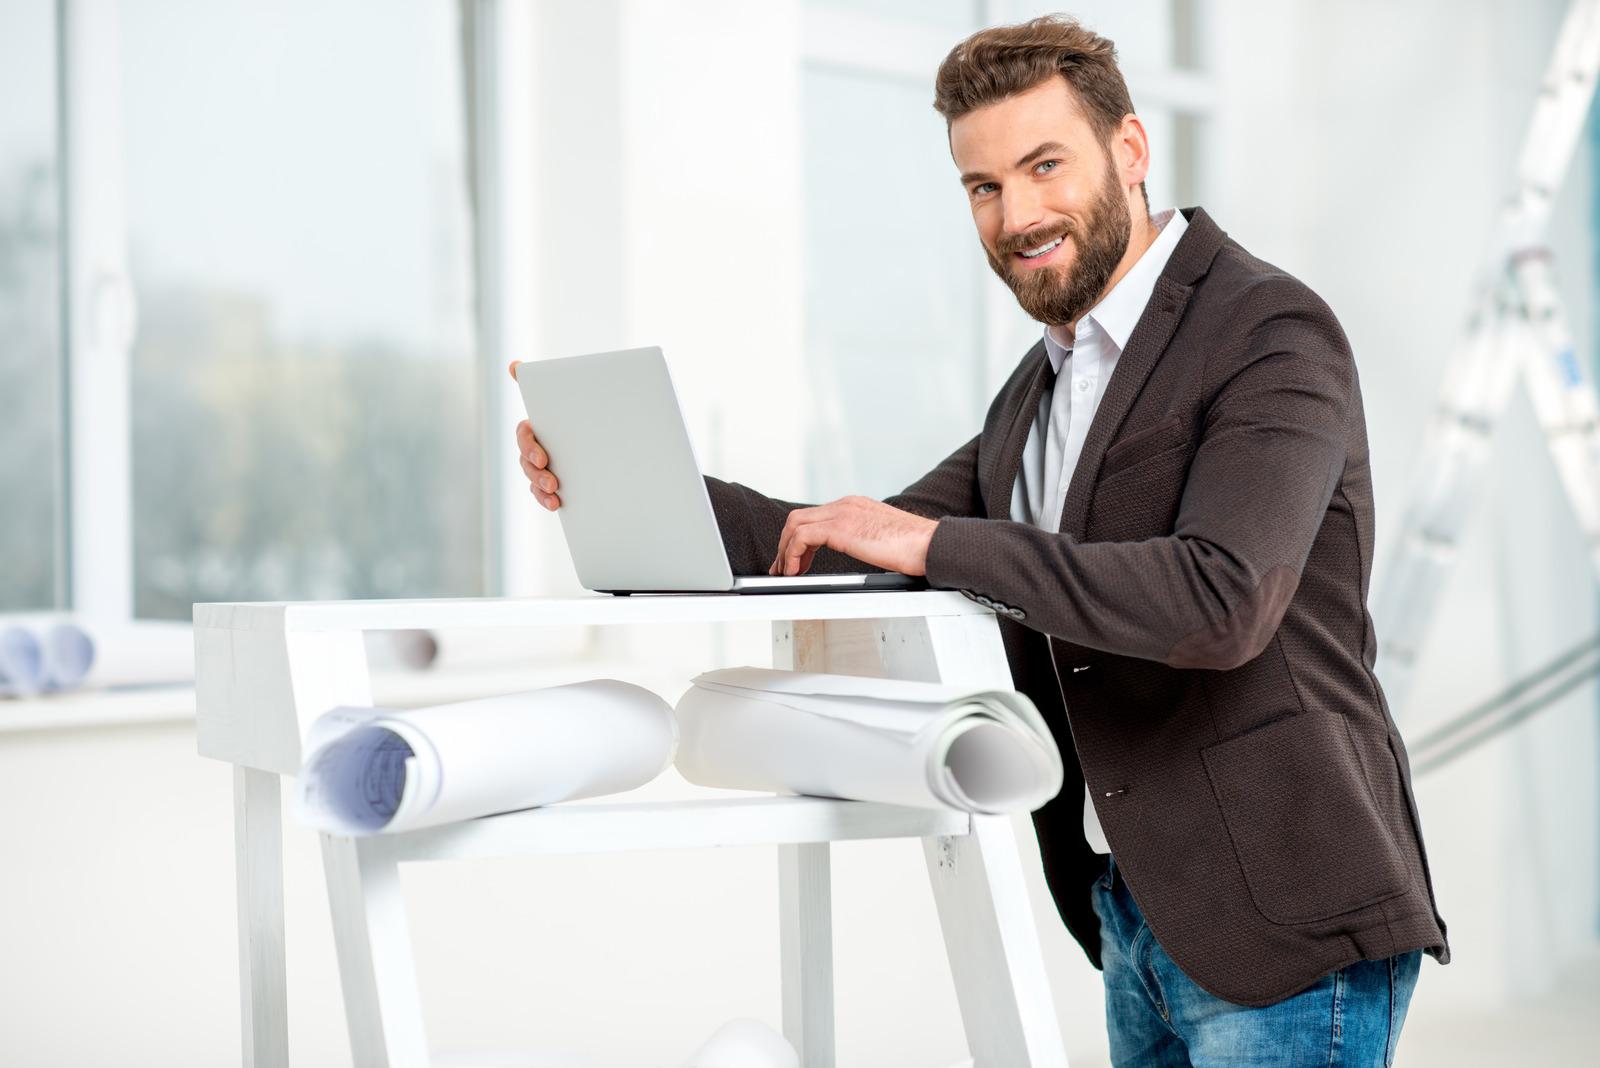 Architect or designer working on laptop - email migration